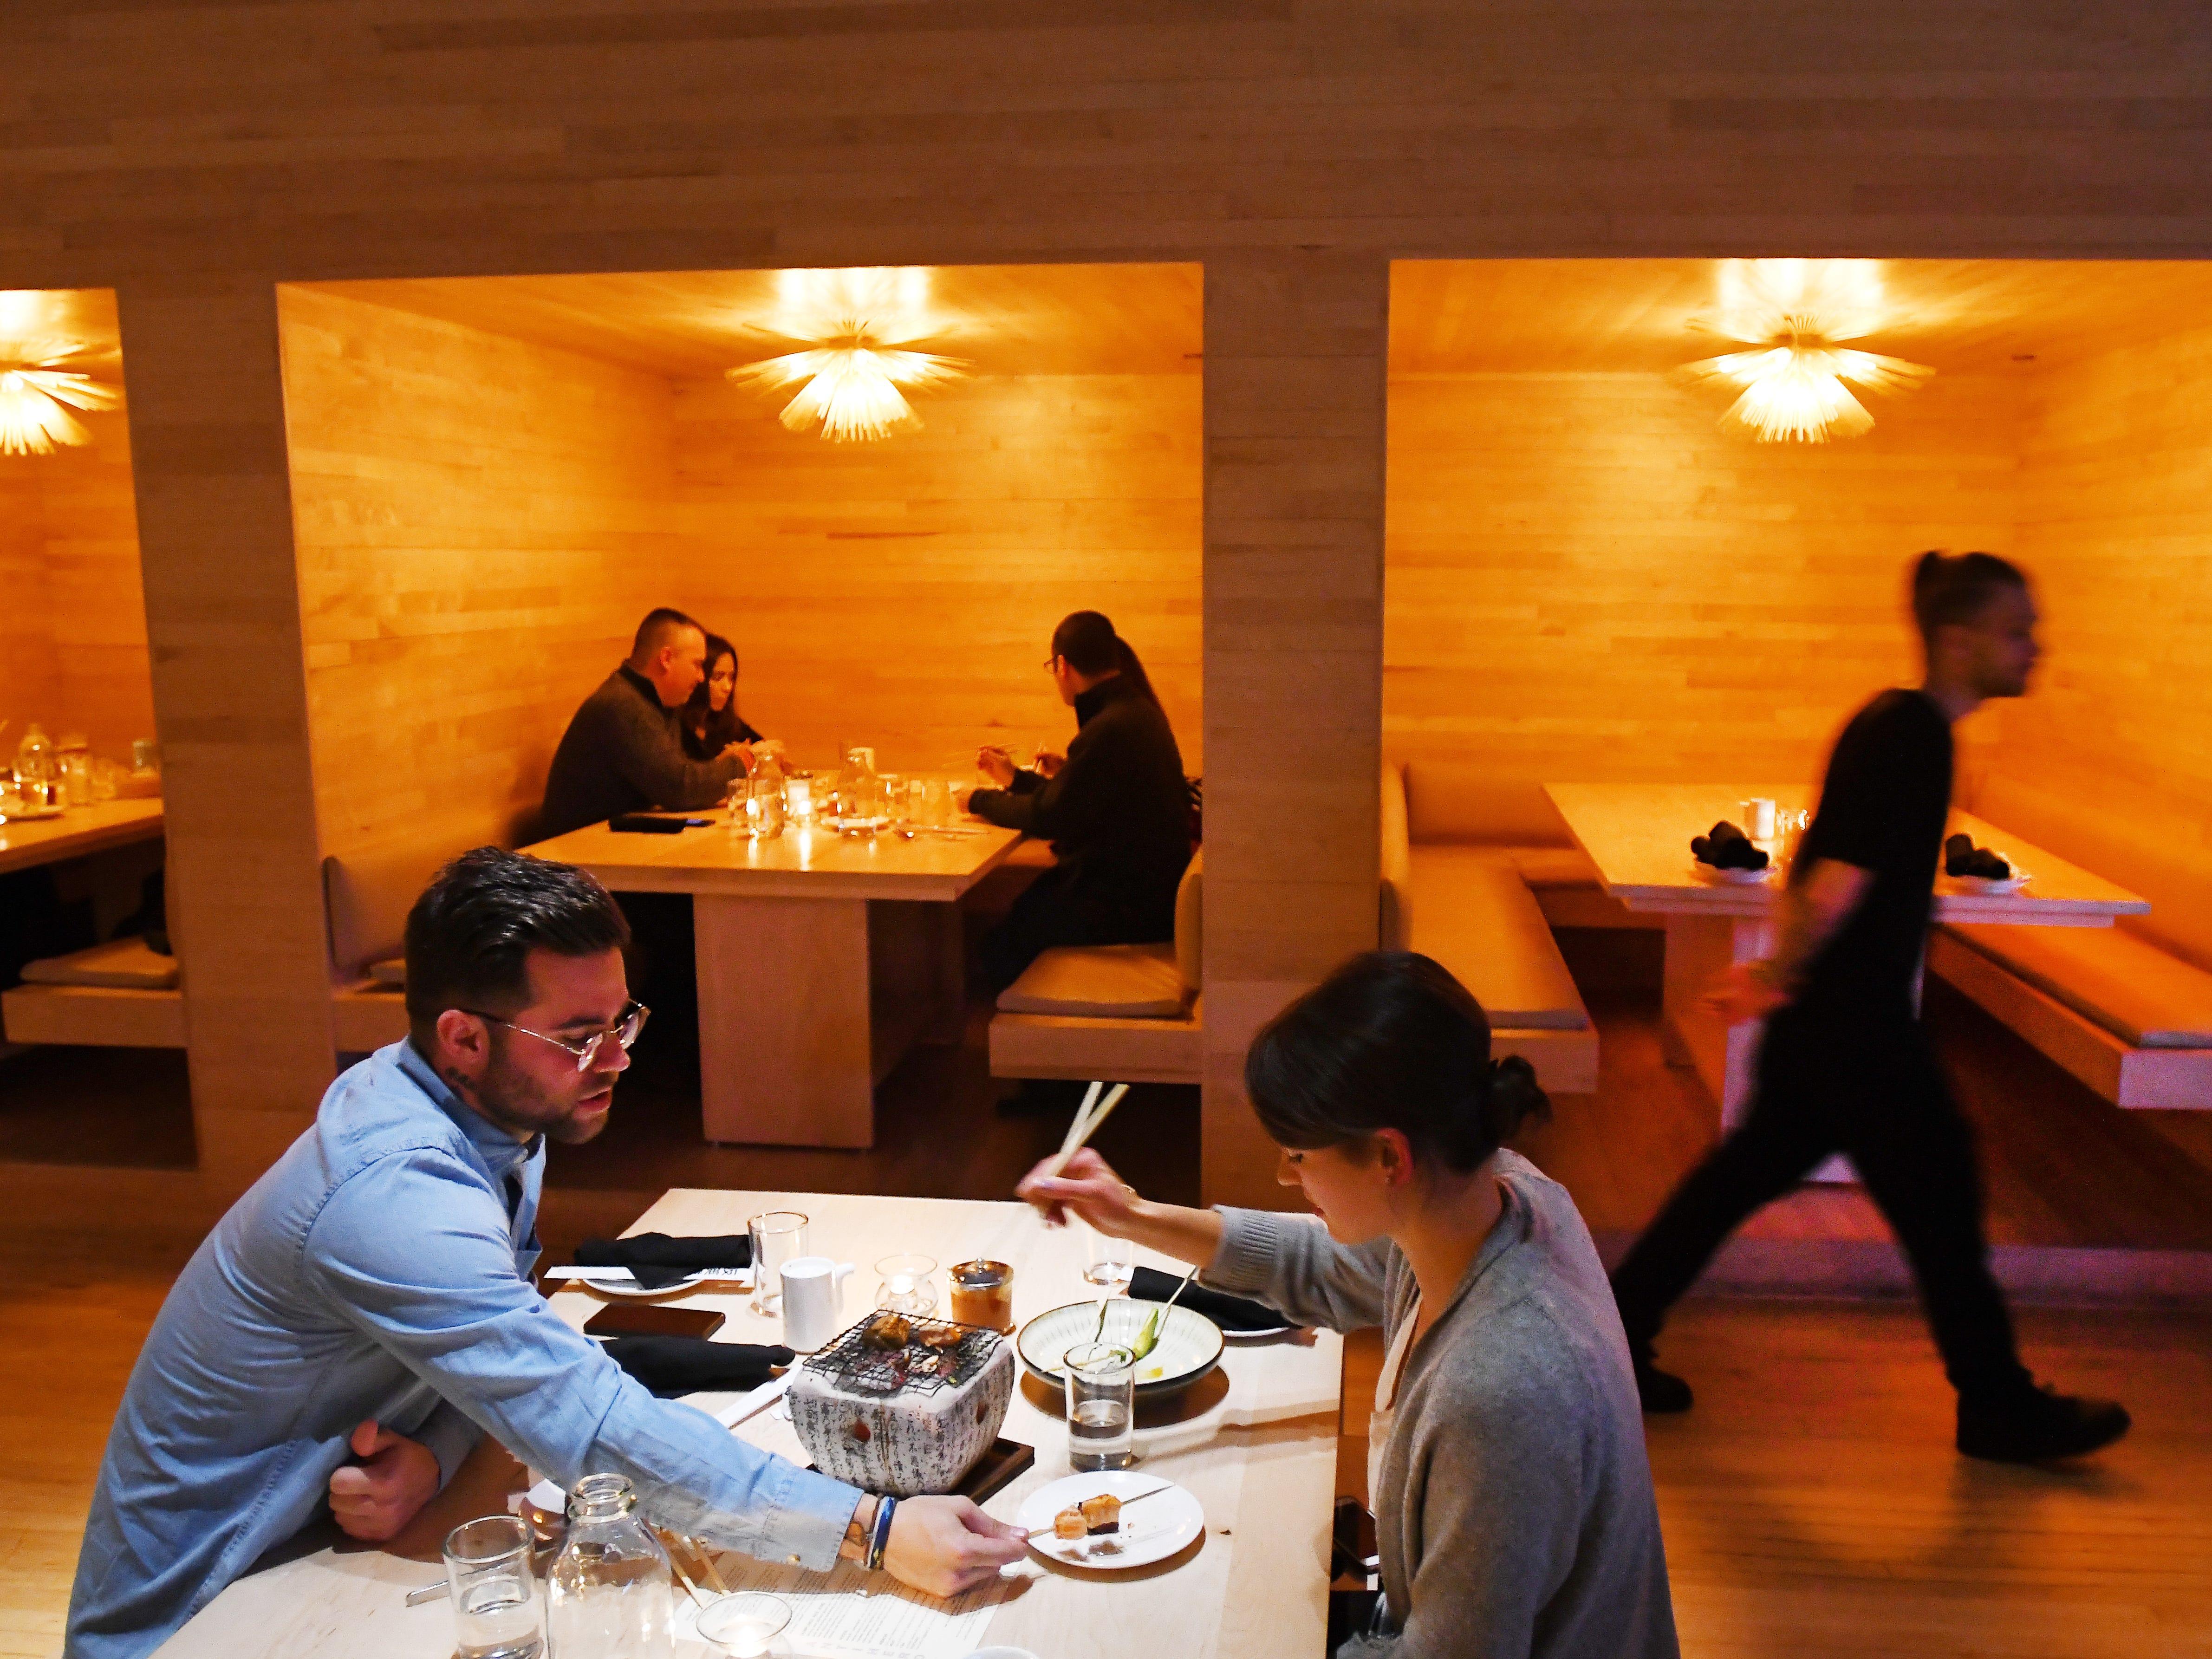 Alexandra McLeod and Alan Wheeler enjoy a hibachi at their table.